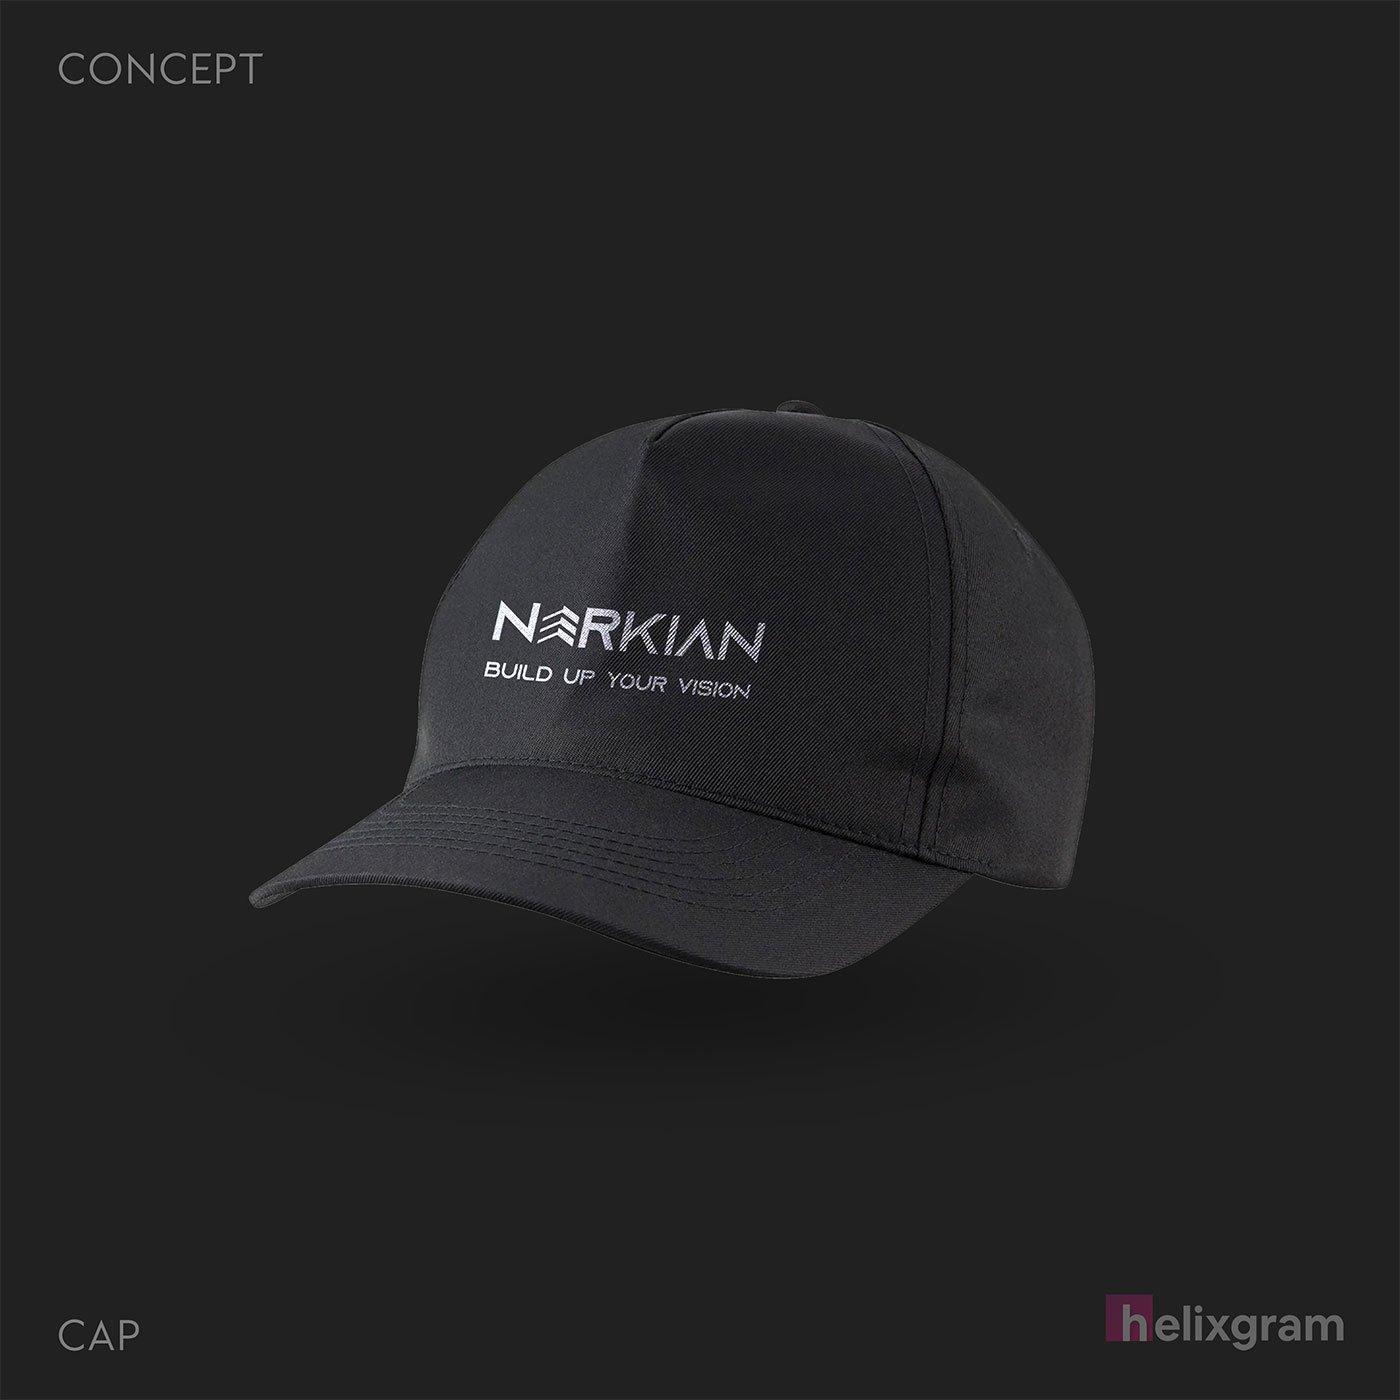 Brand-Identity-Cap-Appareal-Cover-Narkian-design-visual-identity-design-package-corporate-identity-design-logo-design-flyer-poster-book-cover-design-web-design-digital-advertising-Helixgram